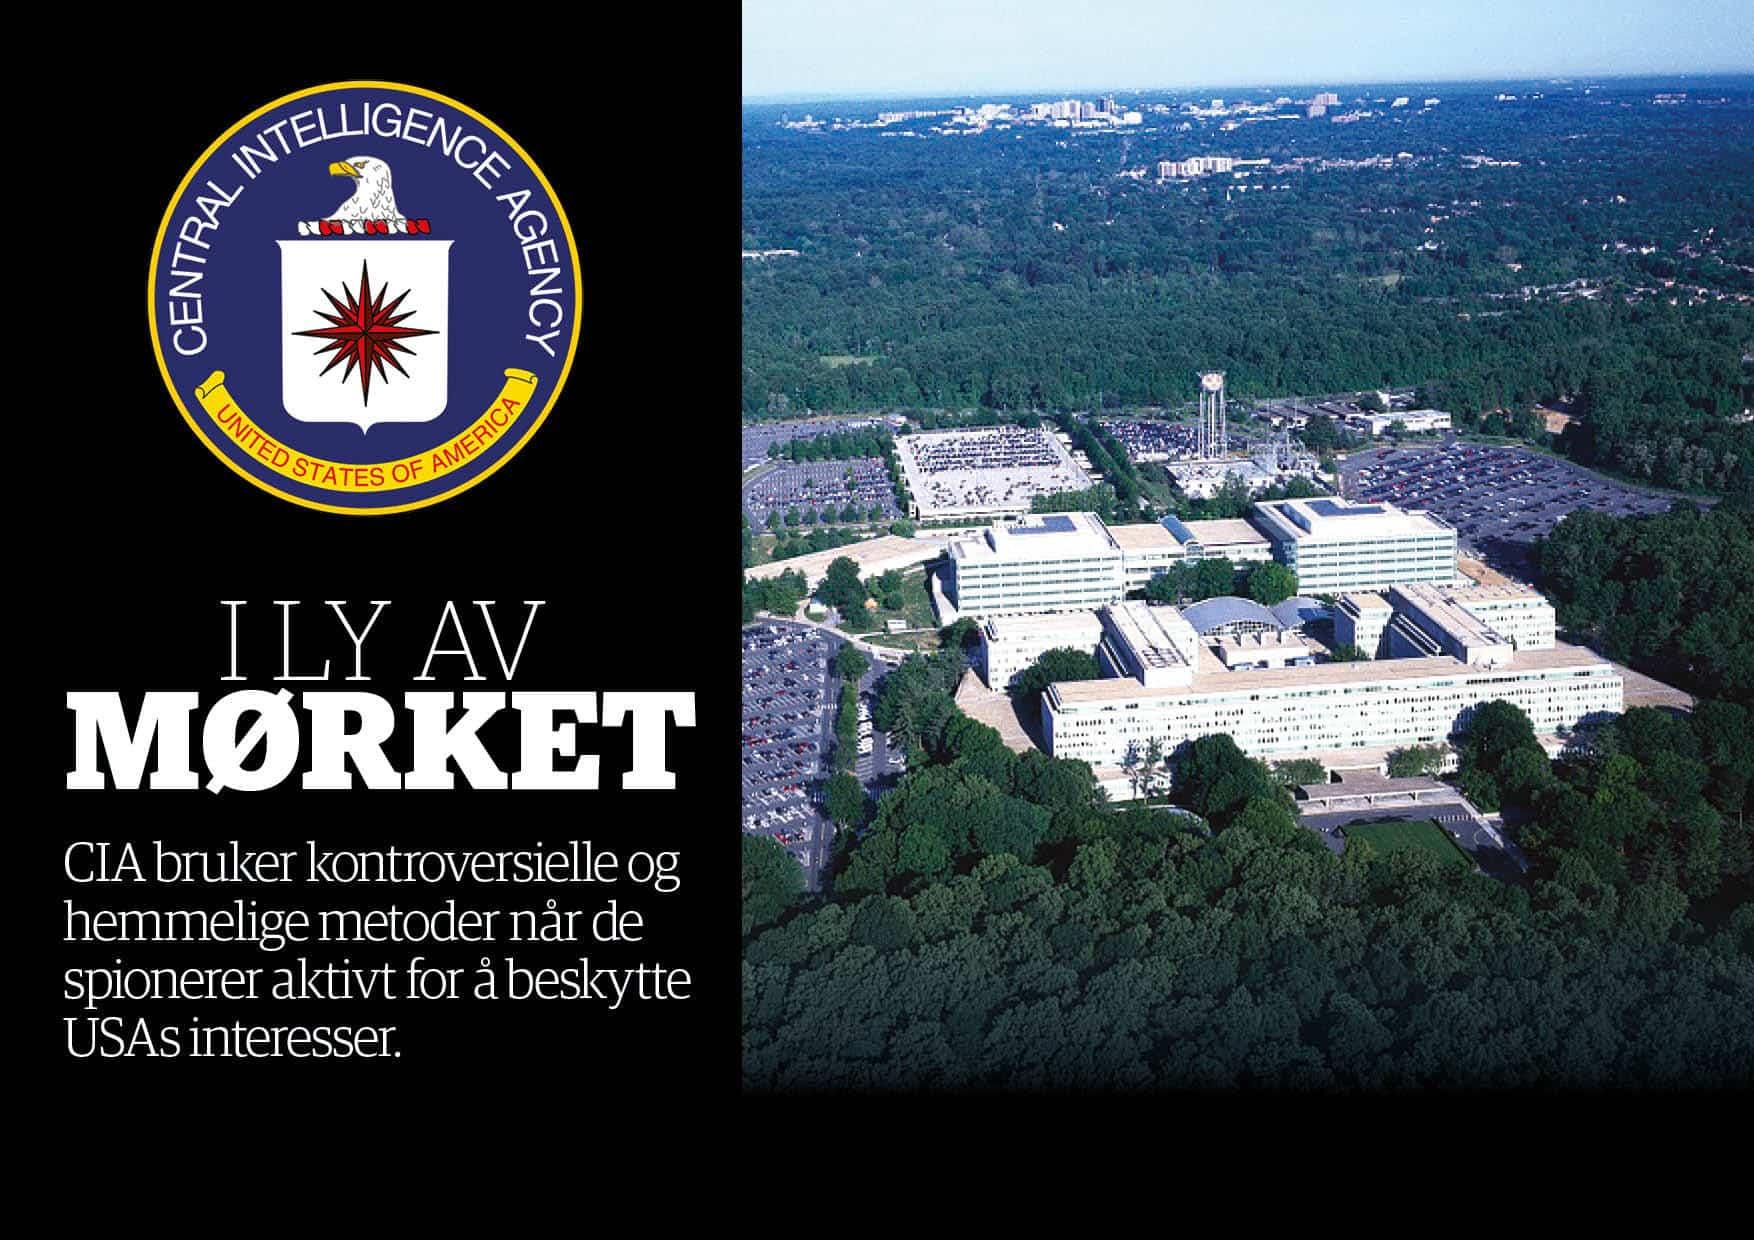 CIA: I ly av mørket